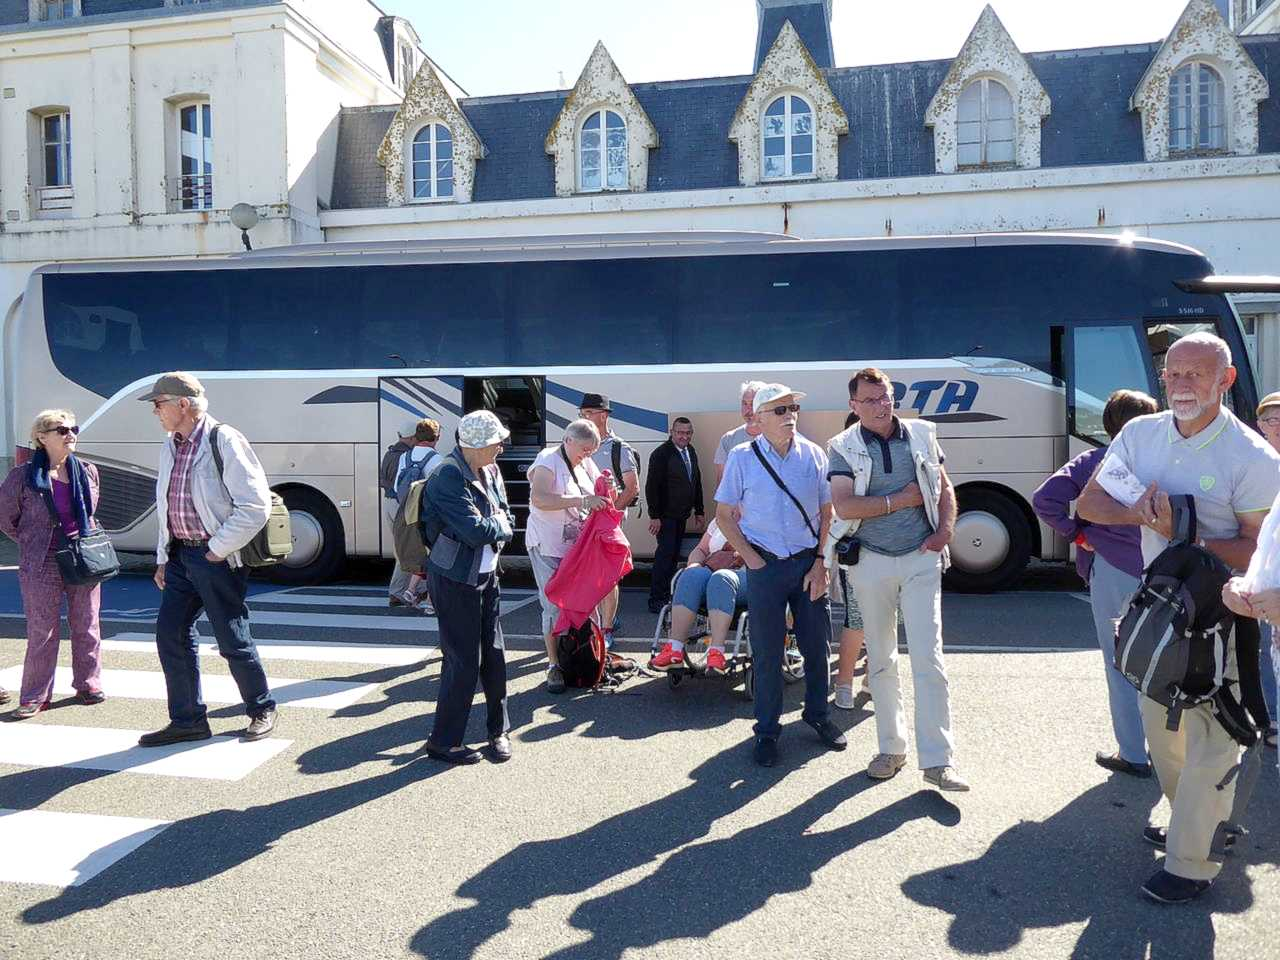 20190622 Tréport Mers les Bains 0001.JPG